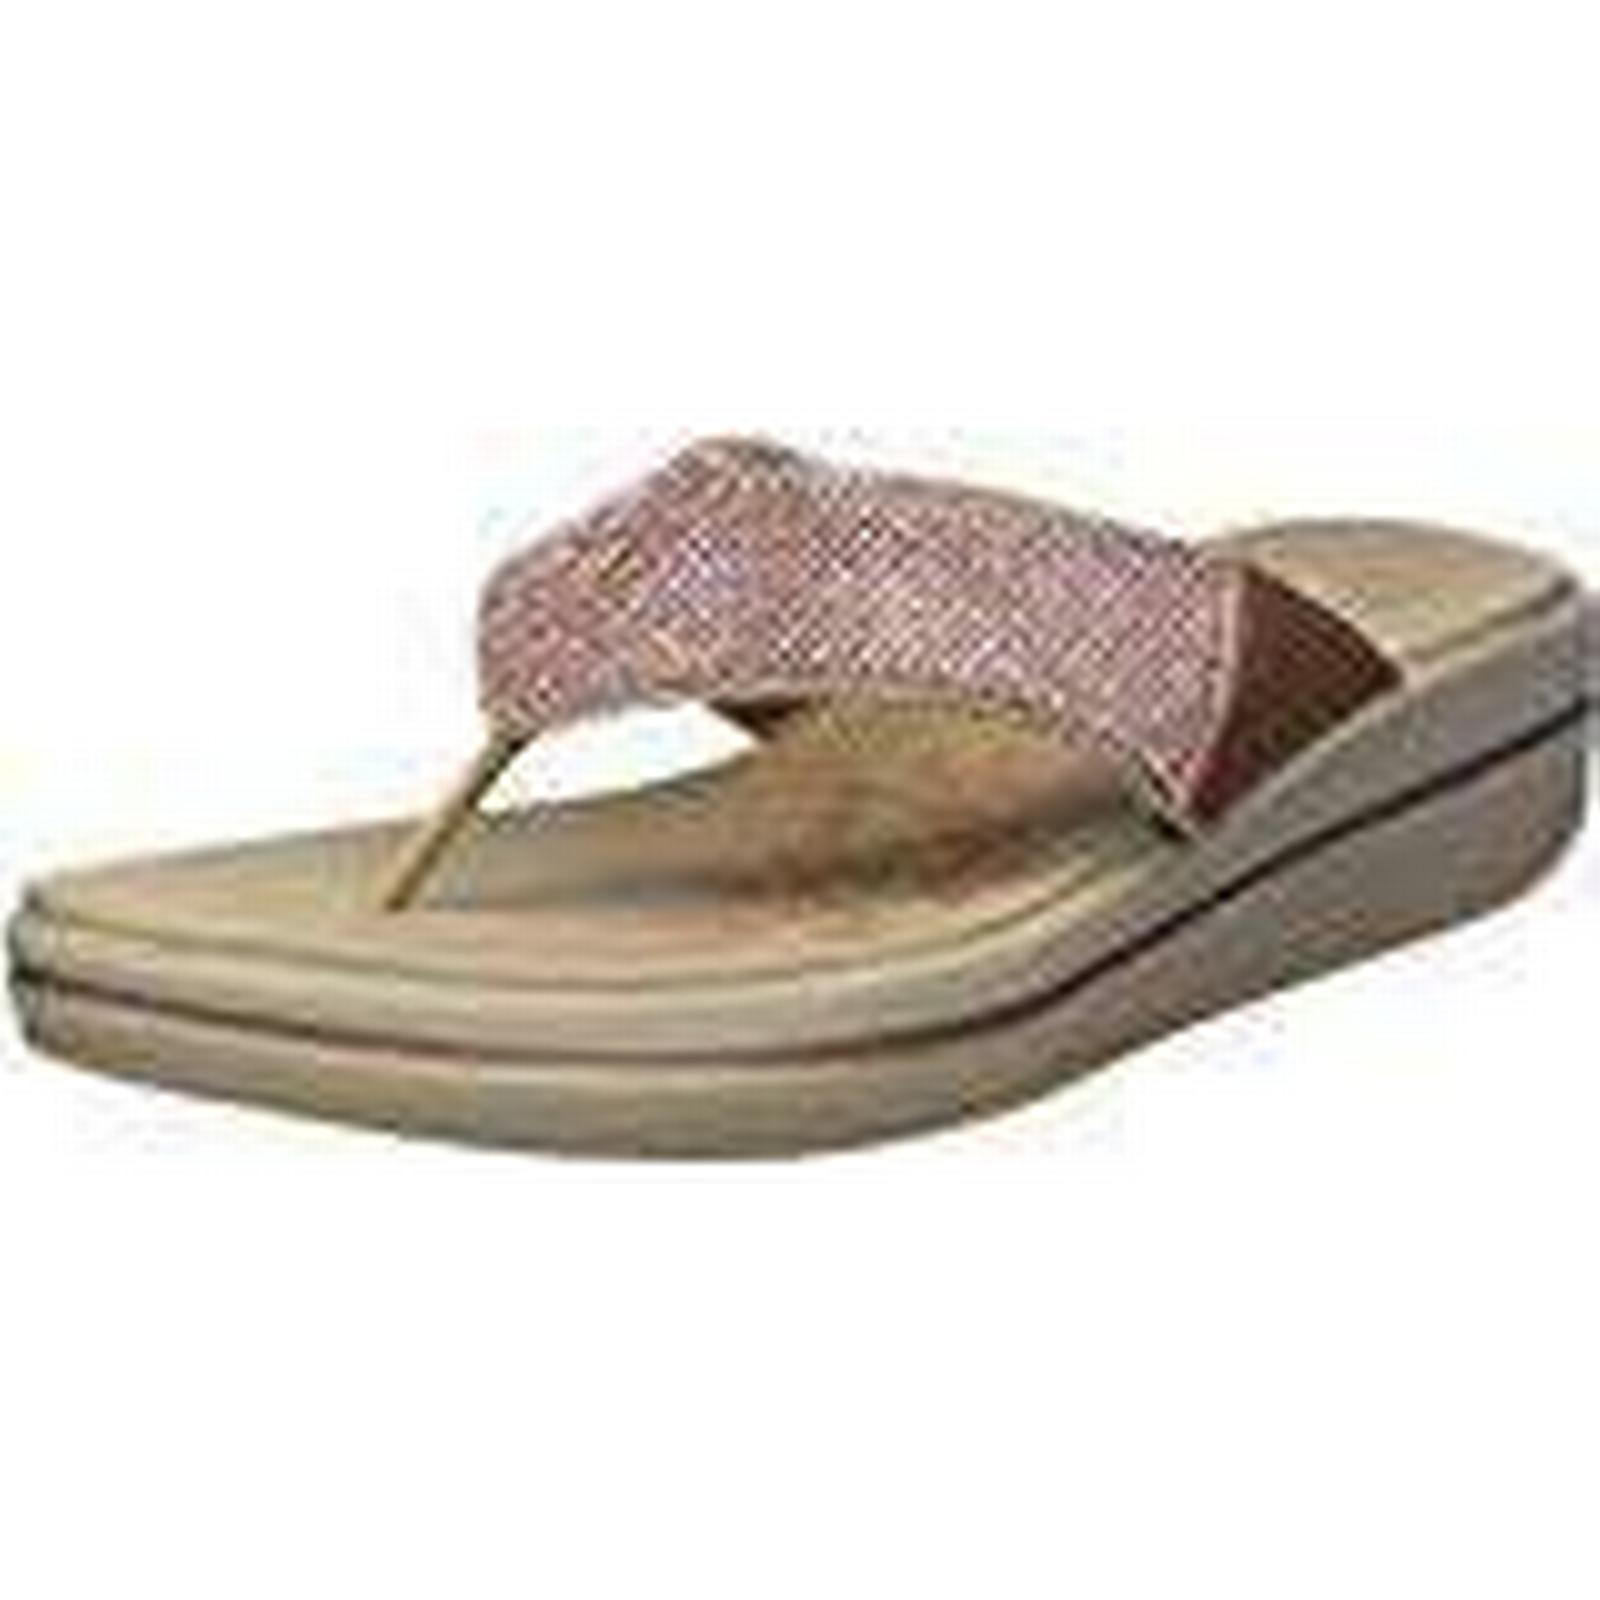 Skechers Women's 41055 Platform Sandals, 41 (Rose Gold), 8 UK 41 Sandals, EU 913403